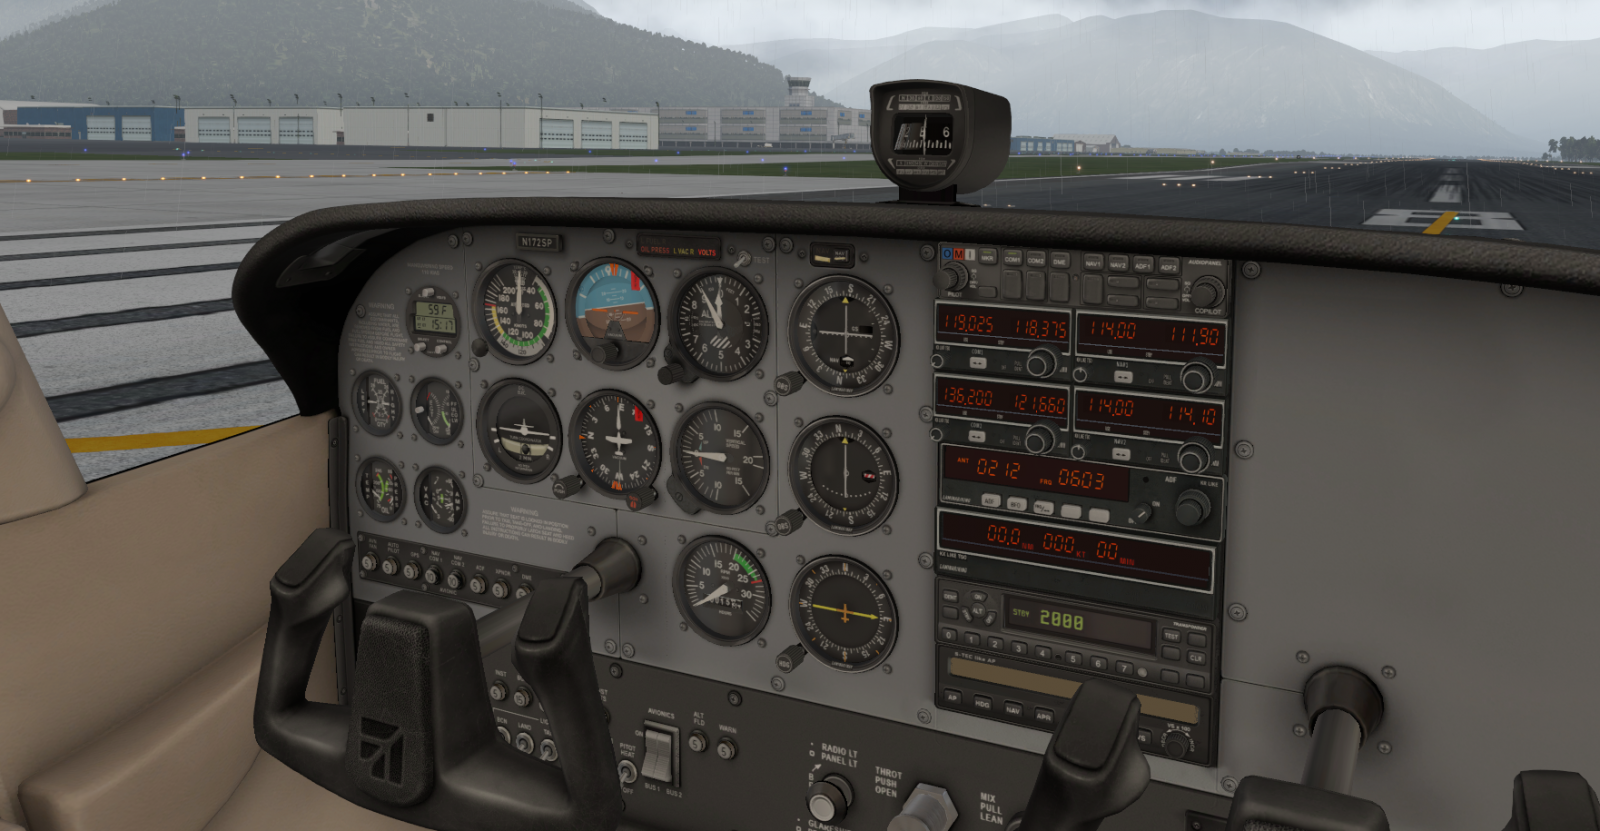 XP11 C172 /A (Slant Alpha) (No GPS) - General Aviation - X-Plane Org